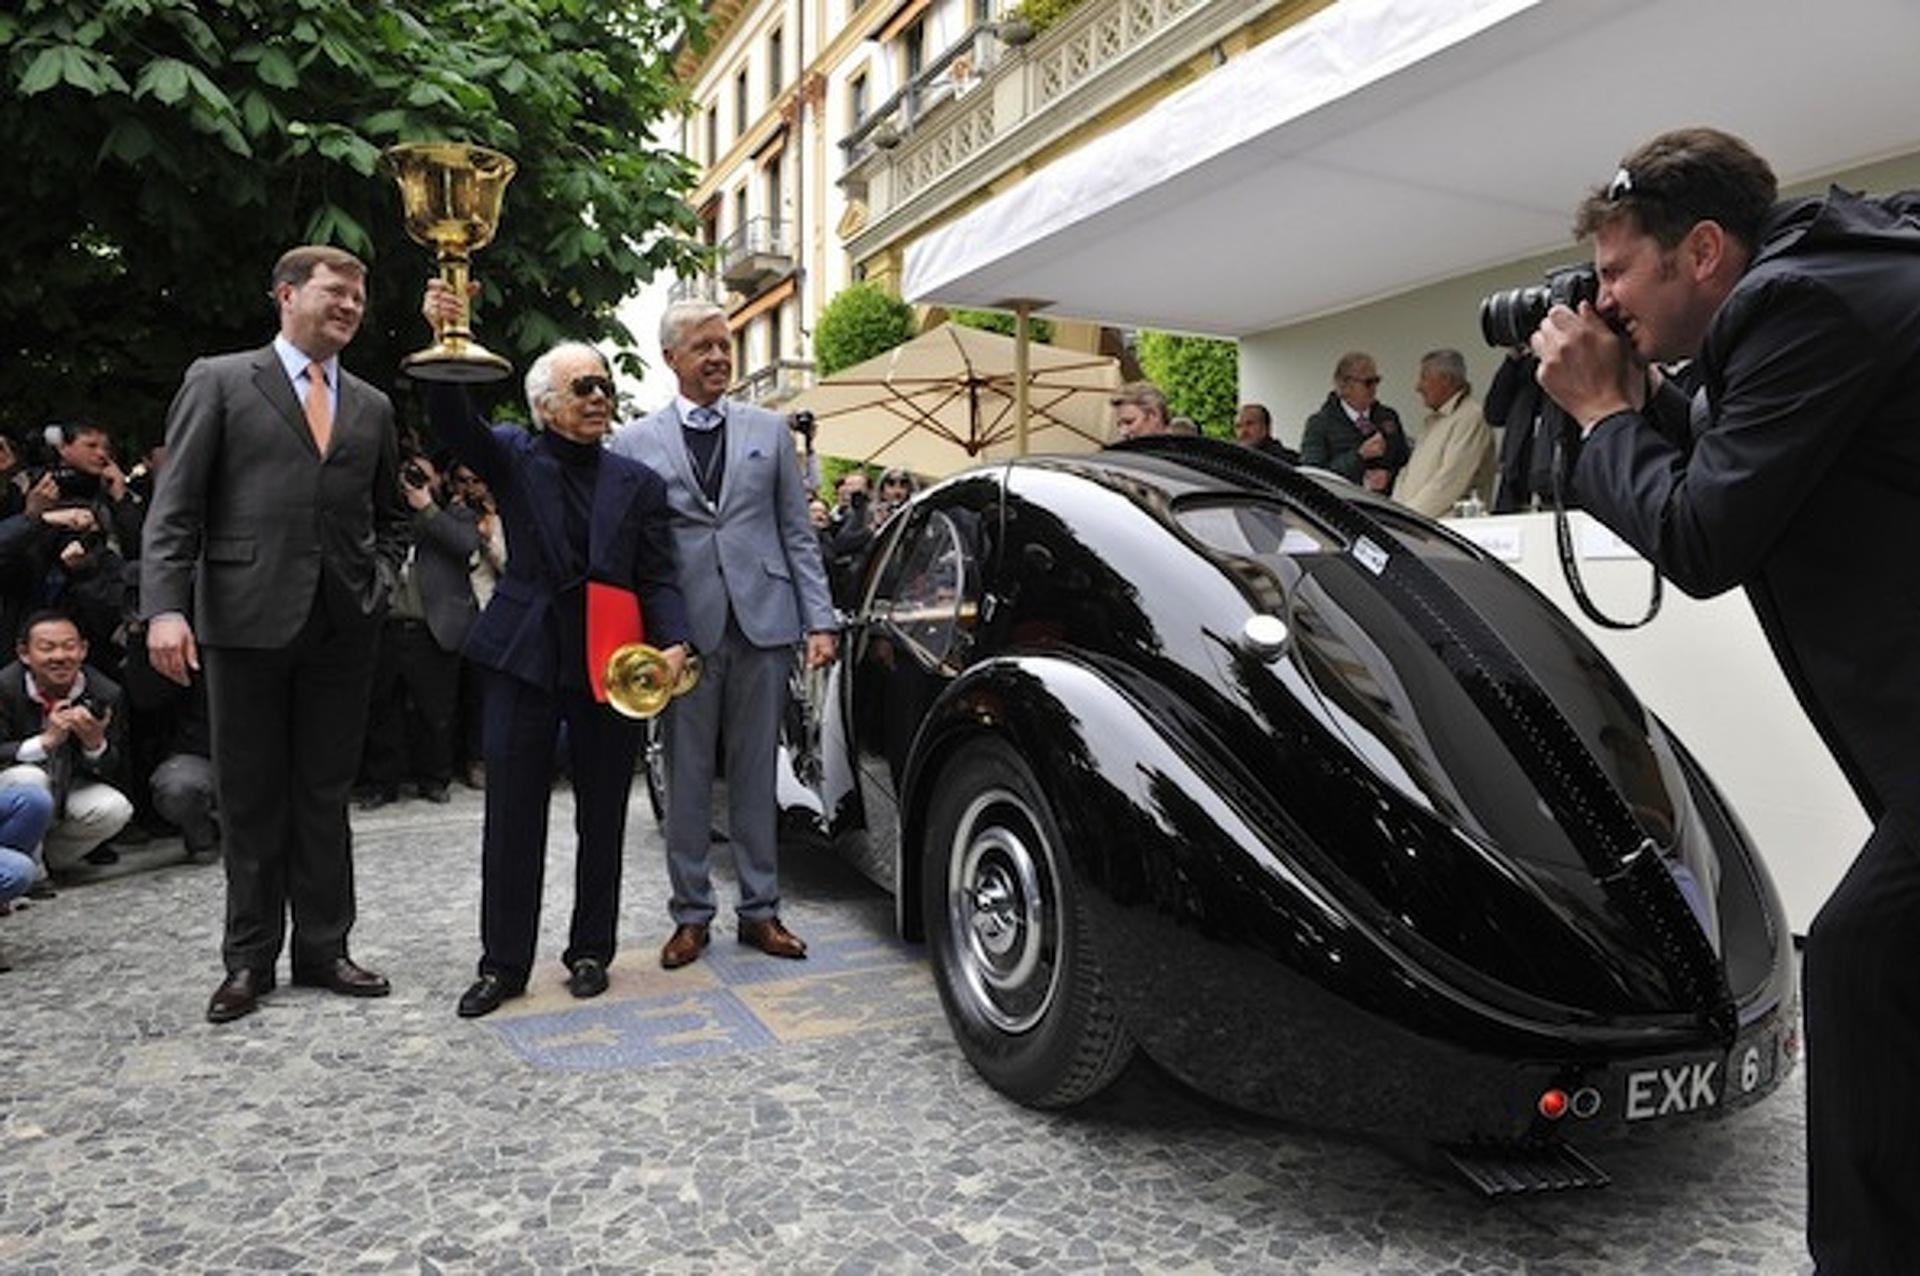 Ralph Lauren's $40M Bugatti Takes Top Honors at Concorso d'Eleganza